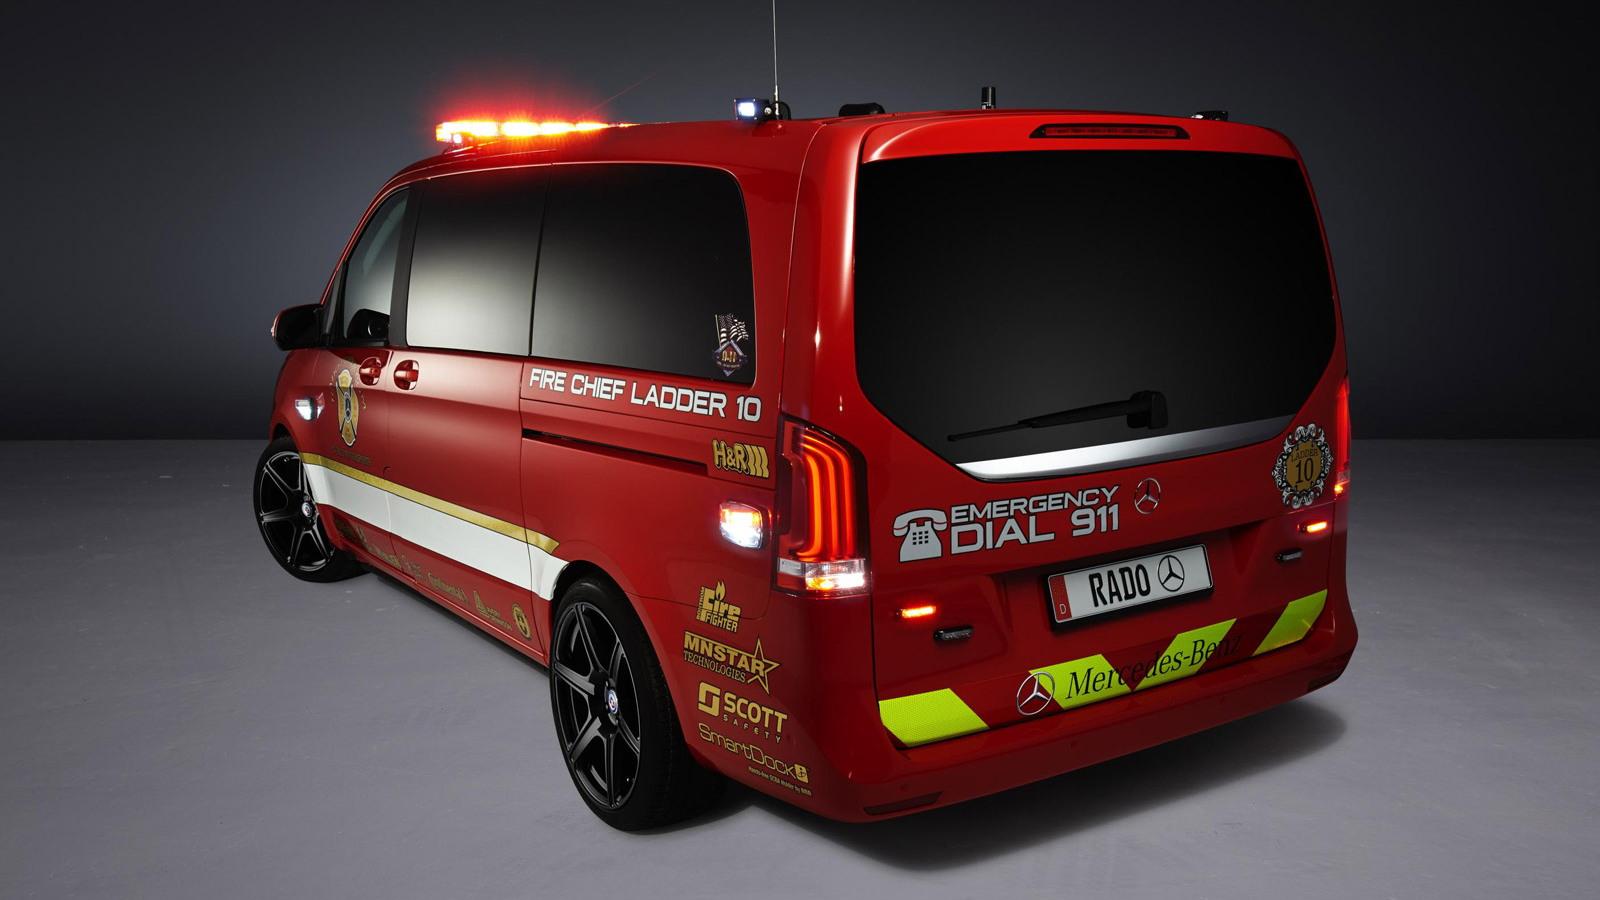 Mercedes-Benz Metris Fire Chief Concept Truck by Rado, 2014 SEMA show